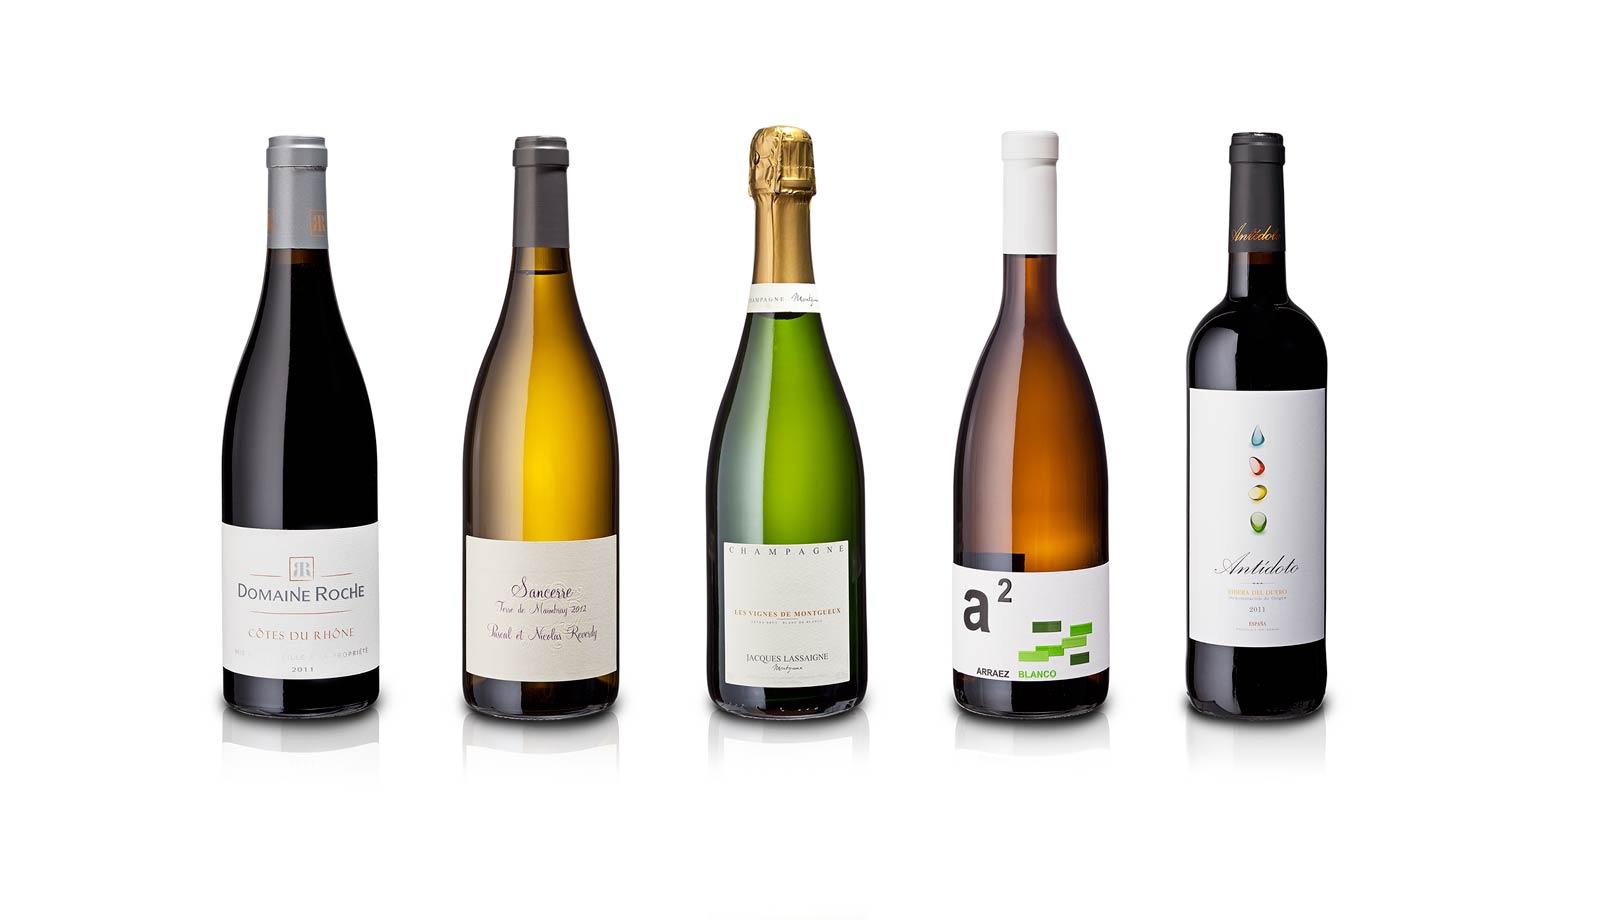 Productfotografie_portfolio_wine